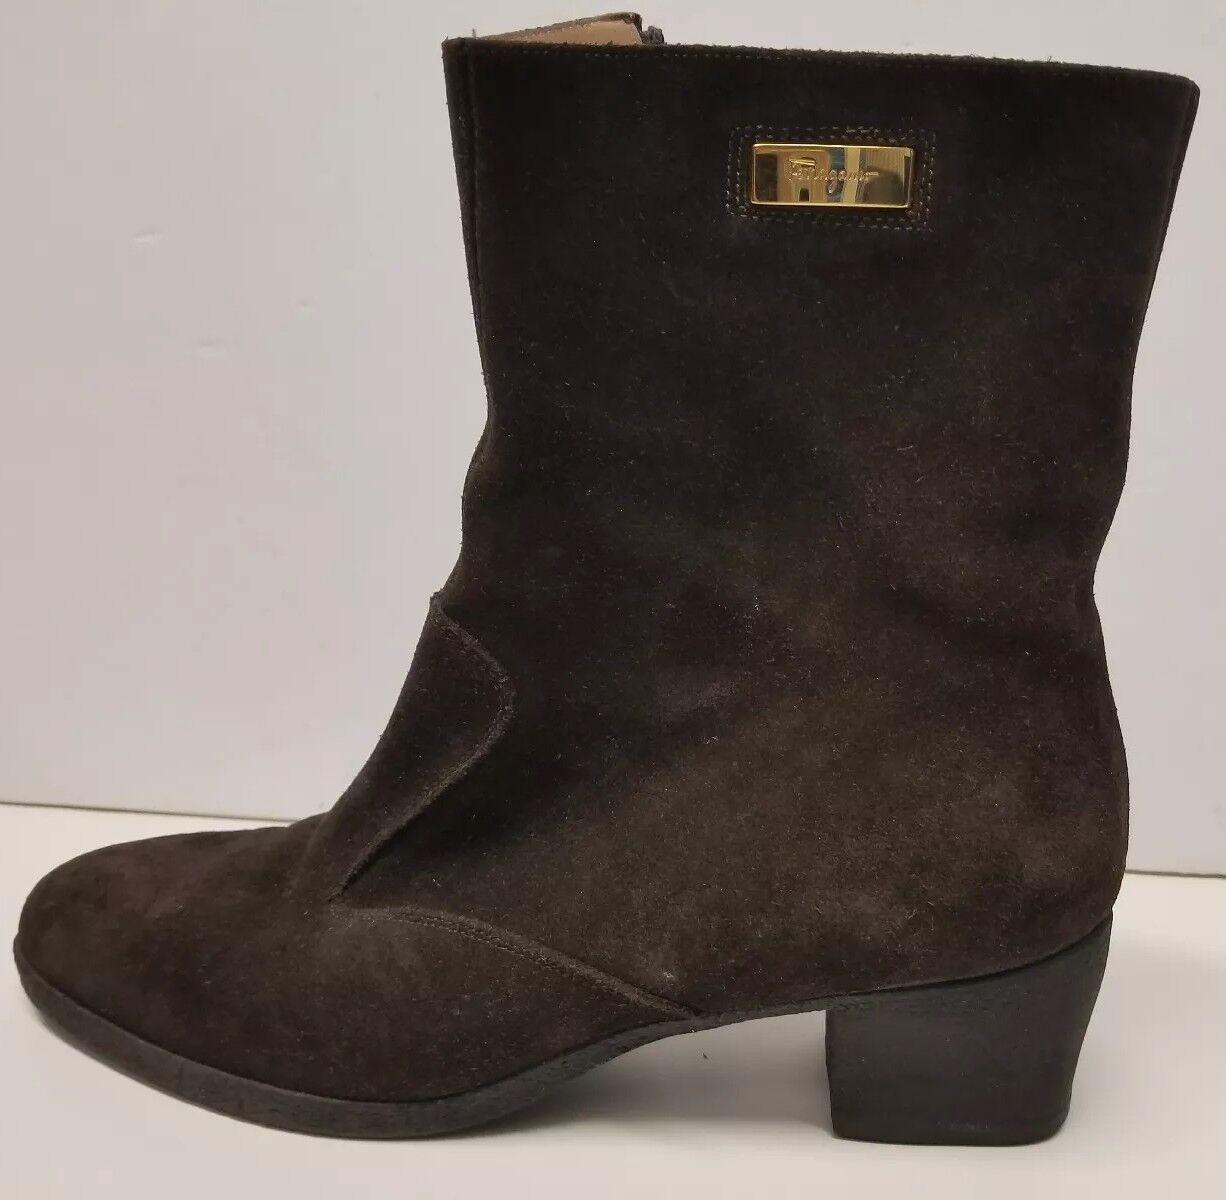 Damens Salvatore Ferragamo LAPO Suede Stiefel 7.5 AA Braun Mustang Buc zipper